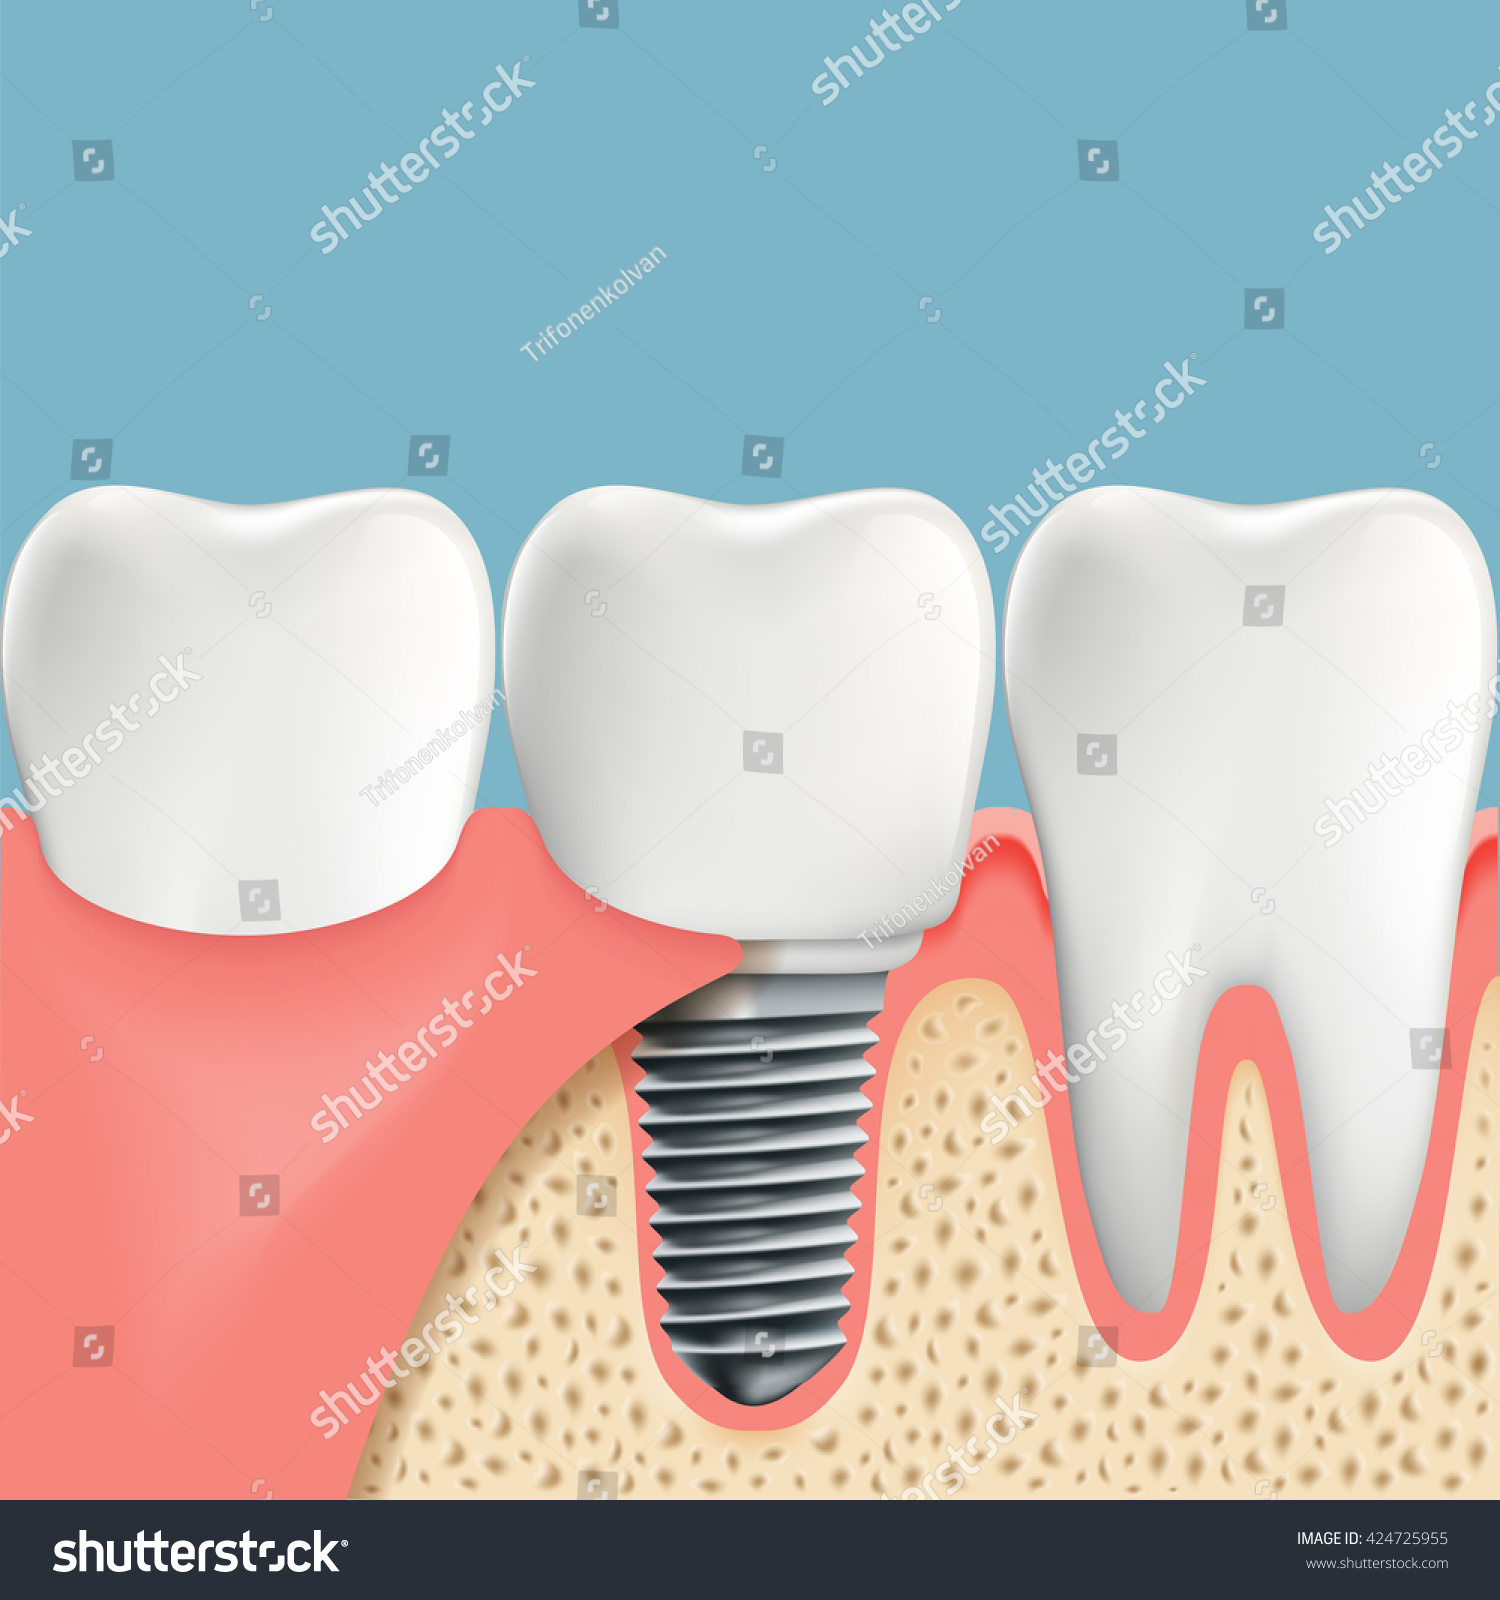 Human Teeth Dental Implant Anatomy Oral Stock Vector Royalty Free